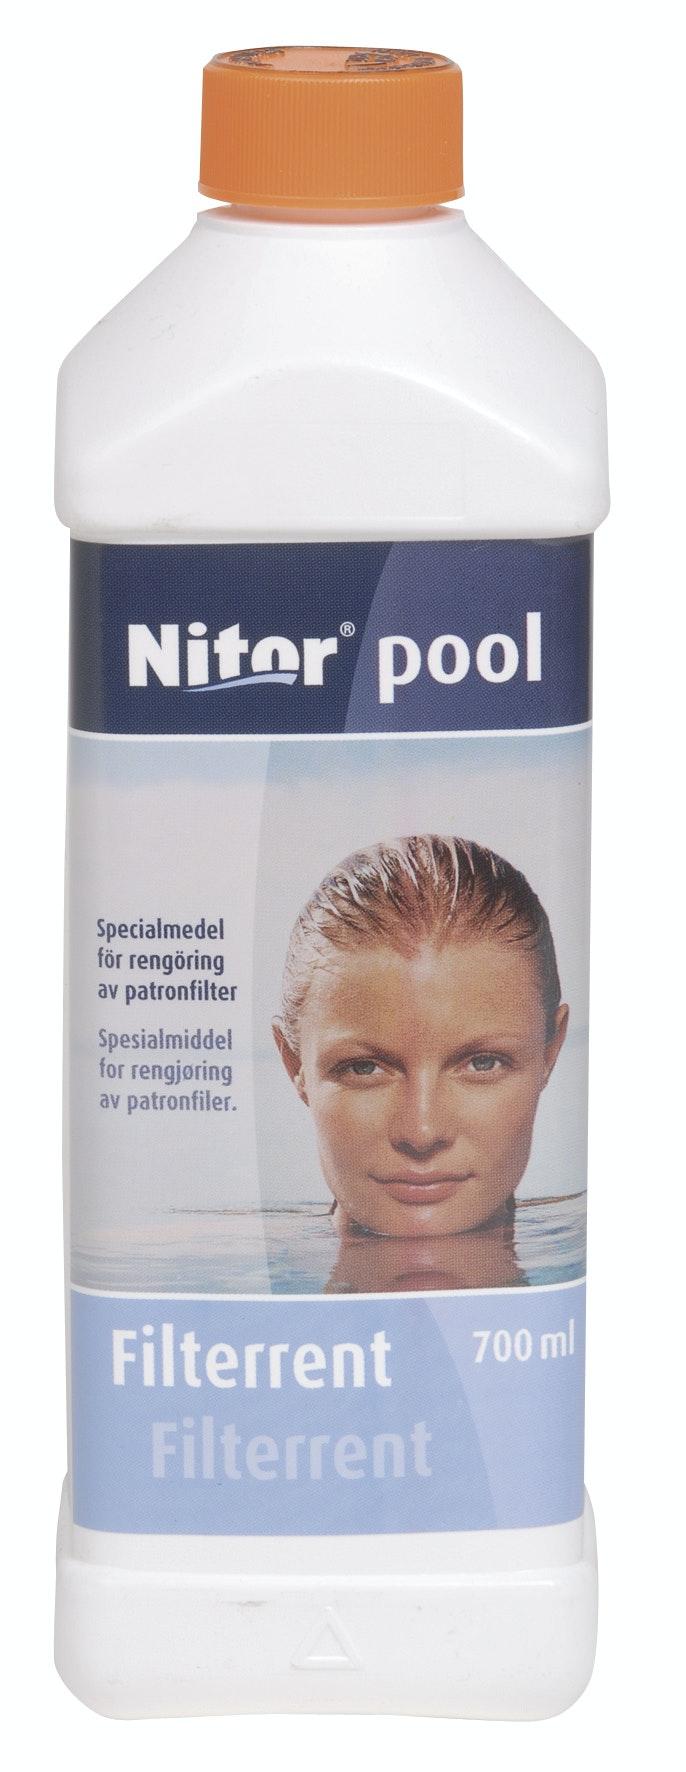 Filterrent Nitor Poolkem